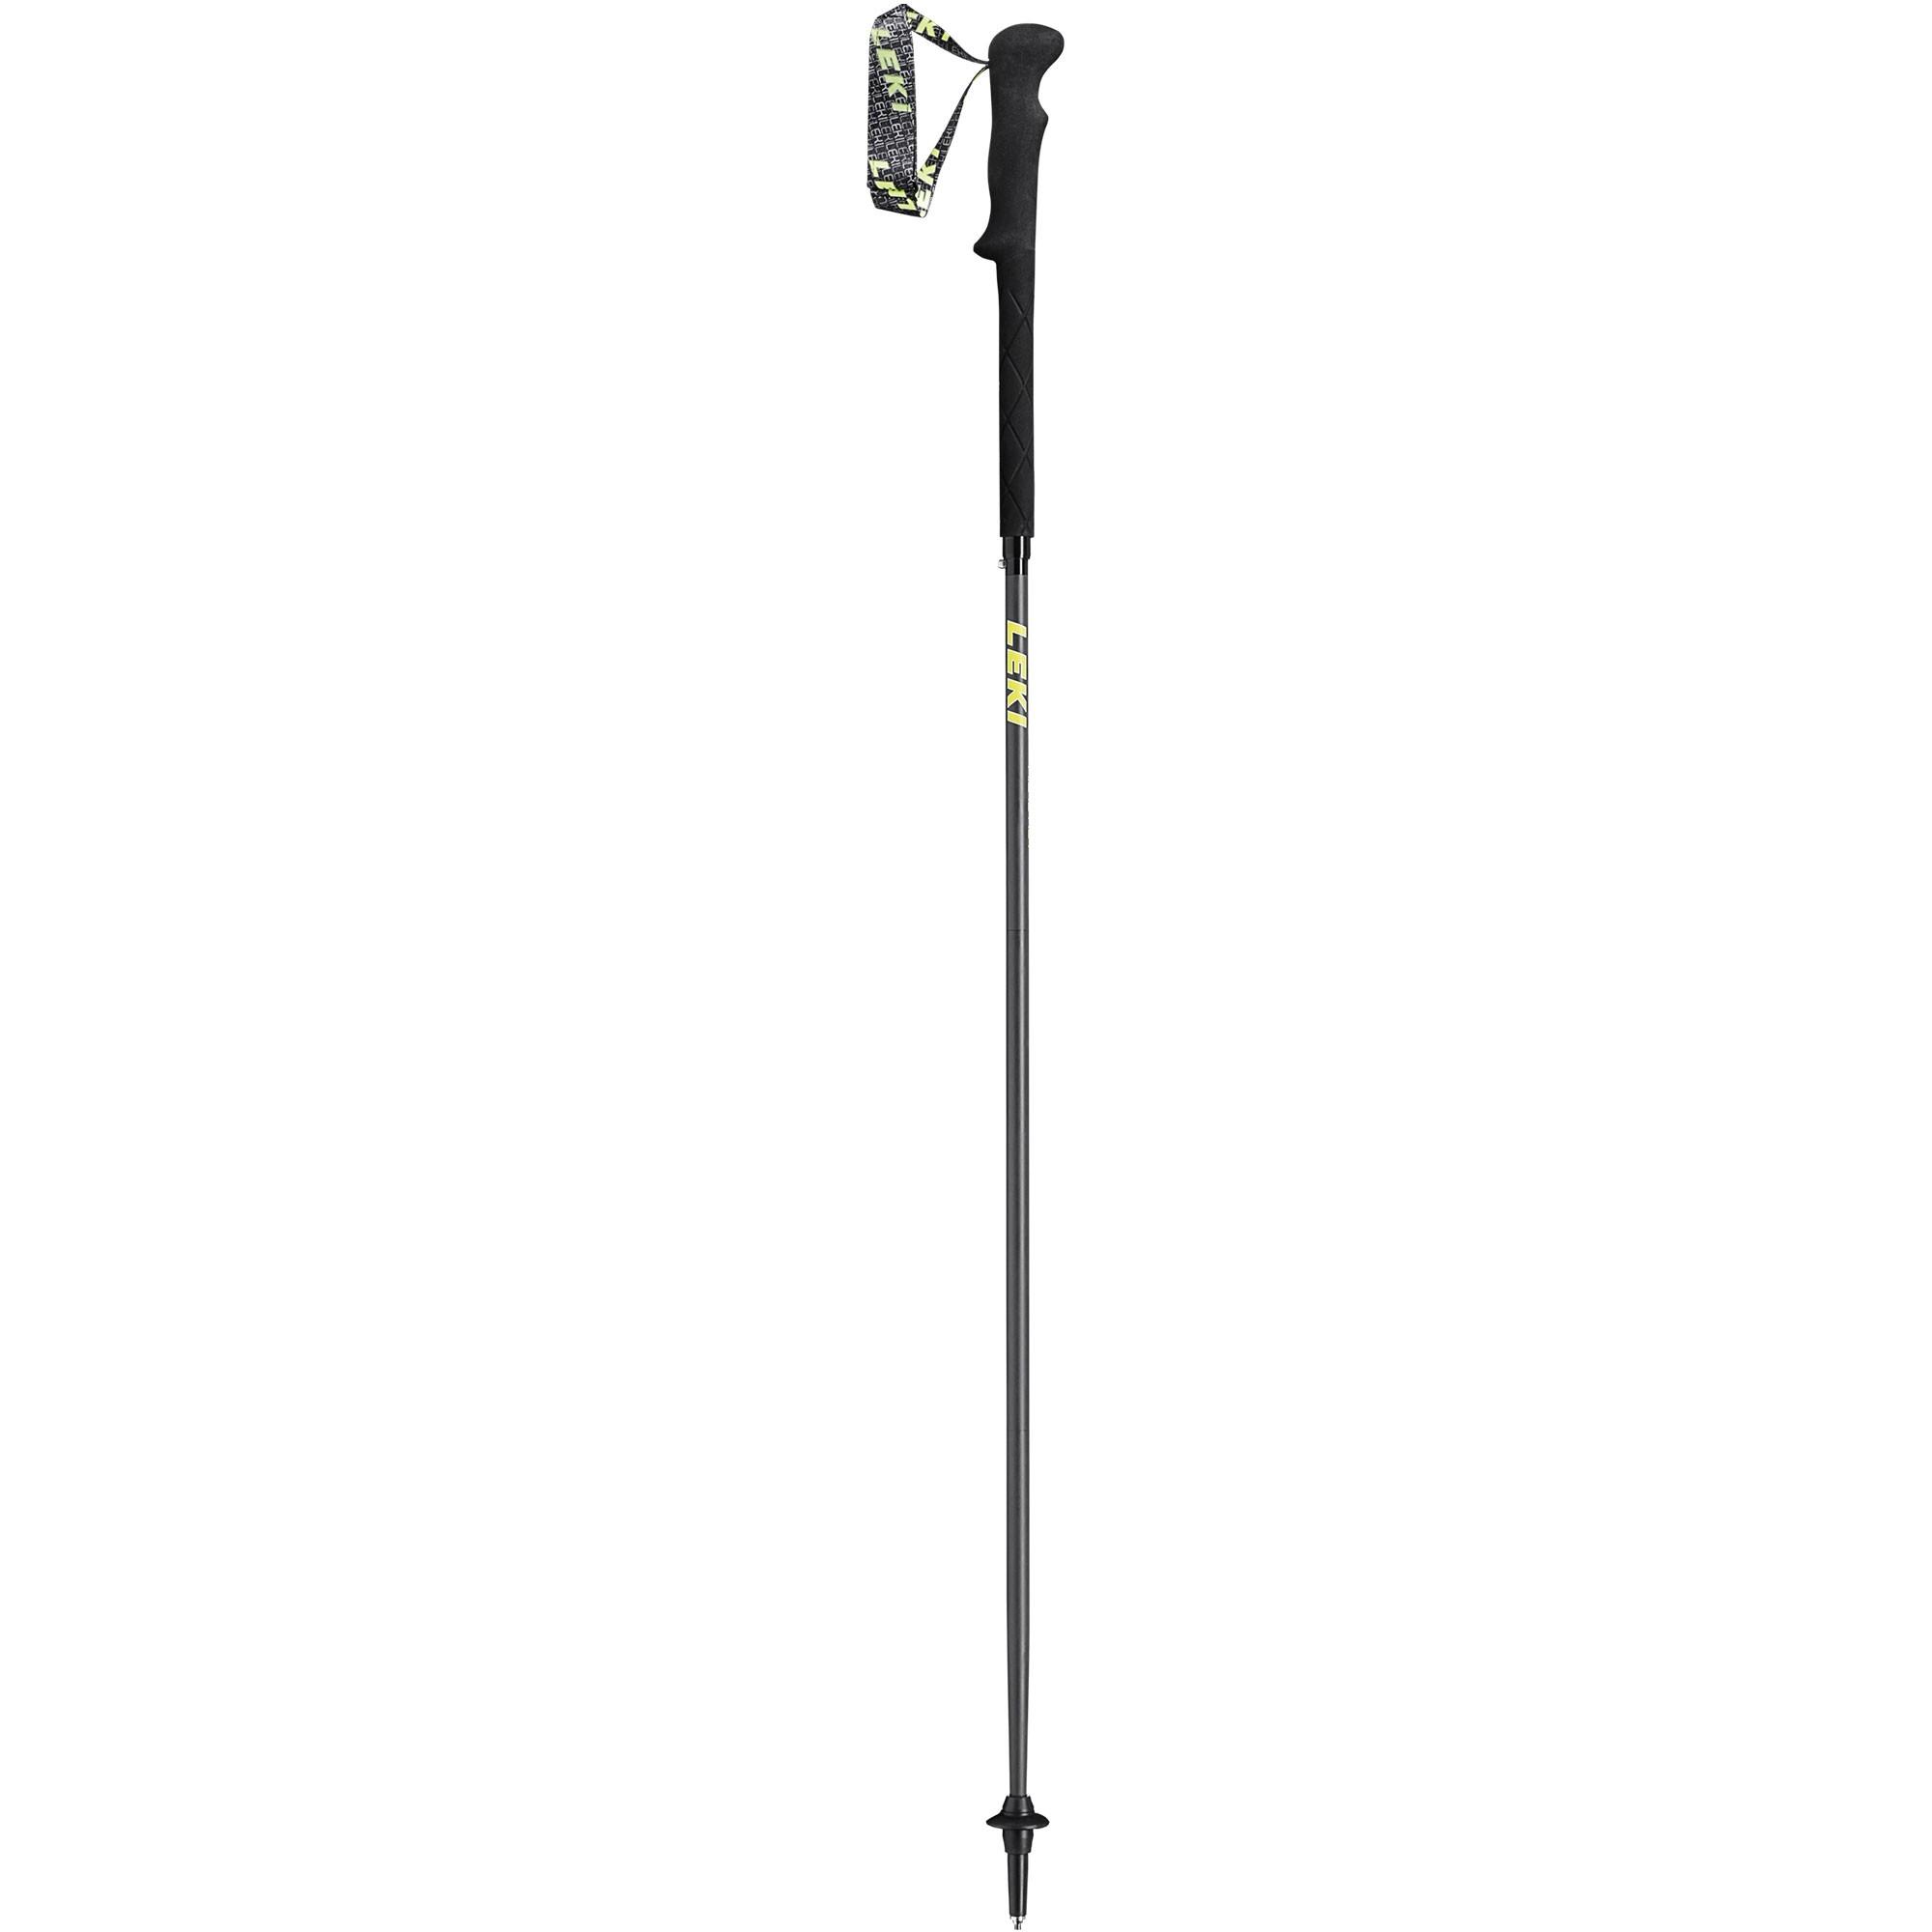 Leki Micro RCM Trail Running Pole